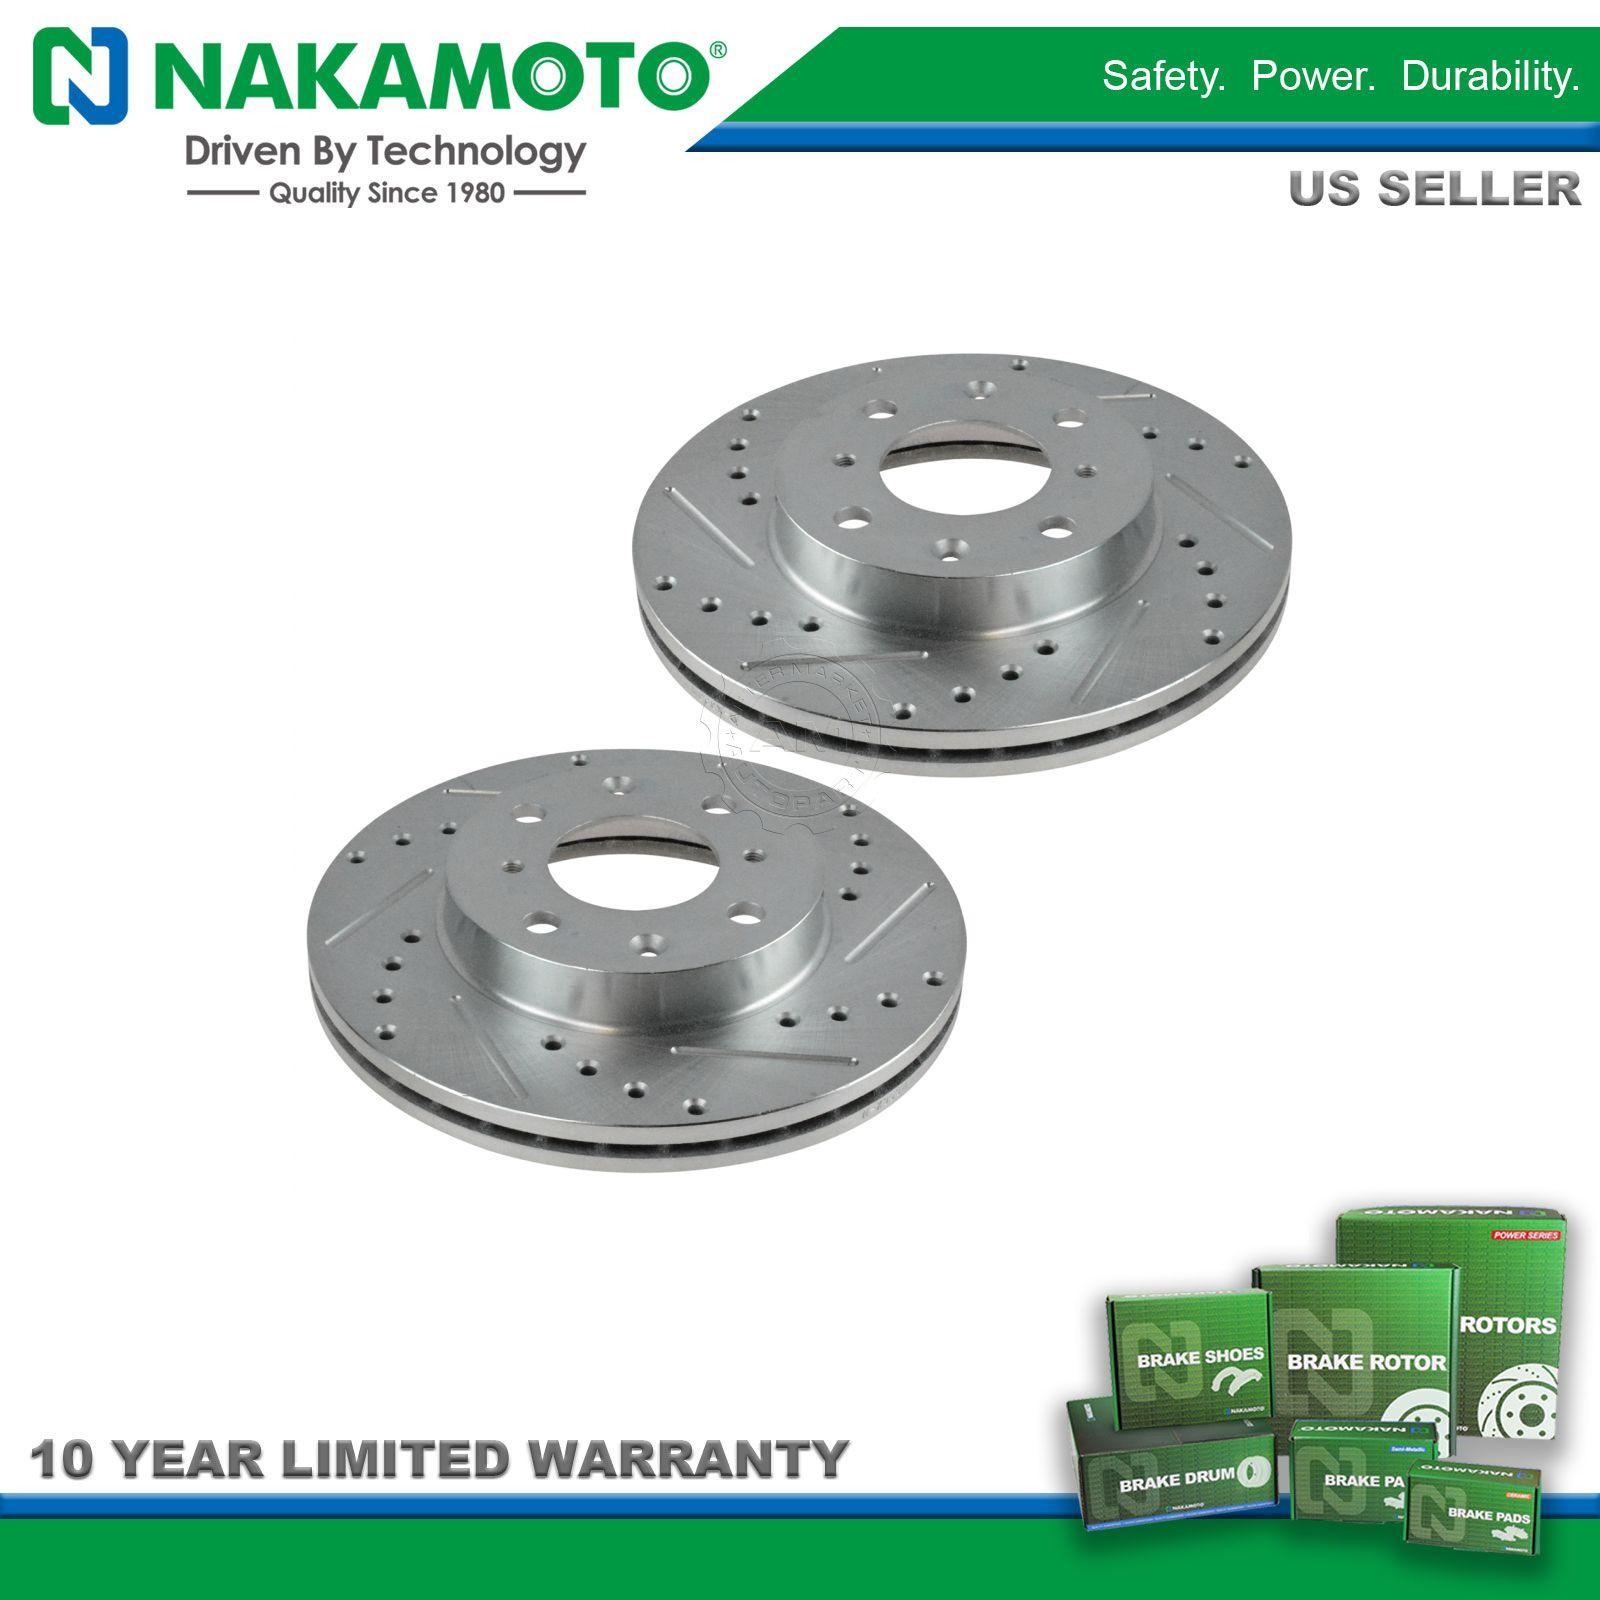 Brakes Lining Rotor : Nakamoto performance disc brake rotor drilled slotted